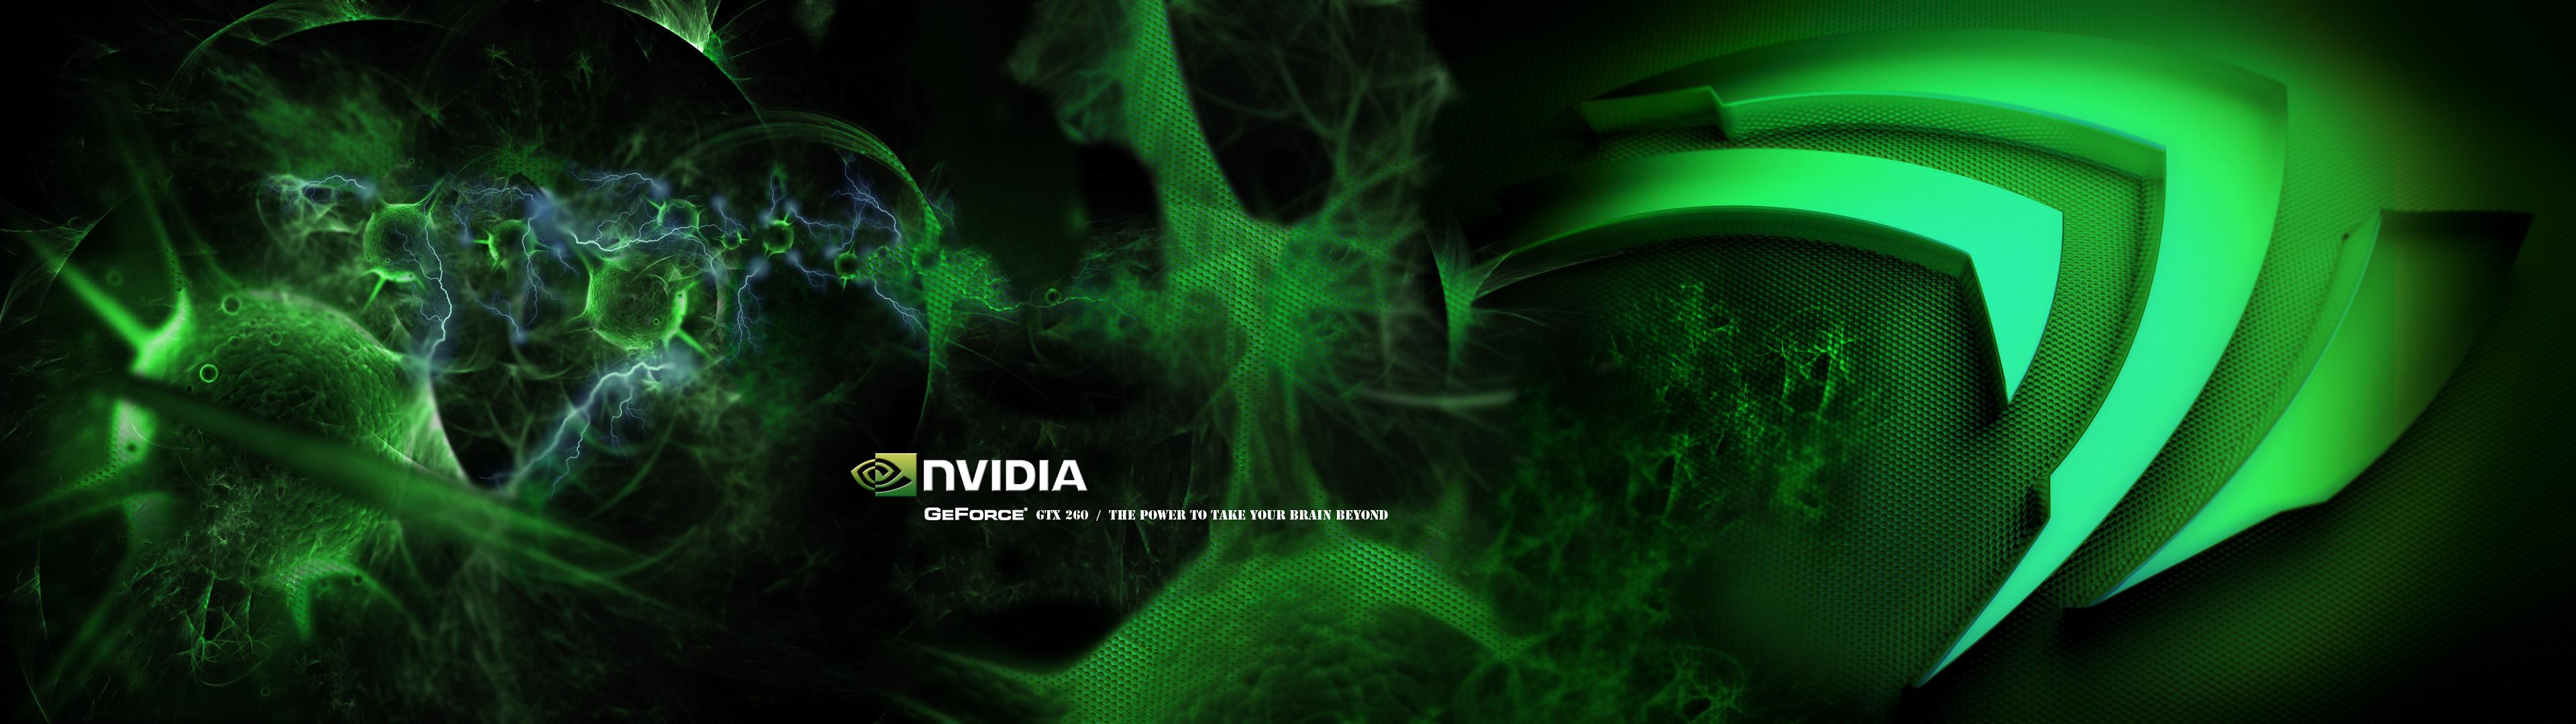 Nvidia Desktop Wallpapers Wallpapers